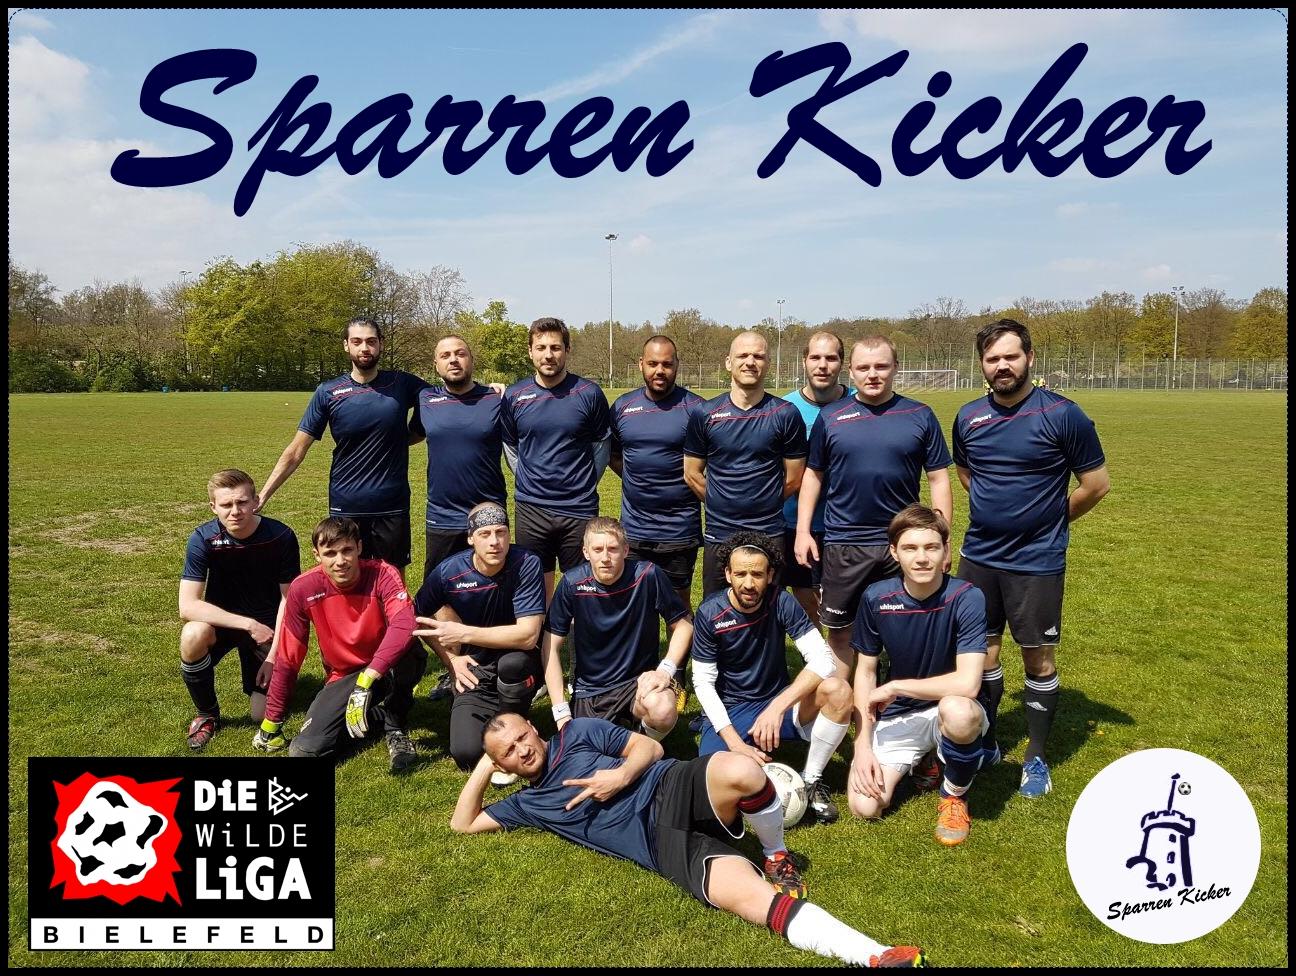 Sparrenkicker_Sibbe